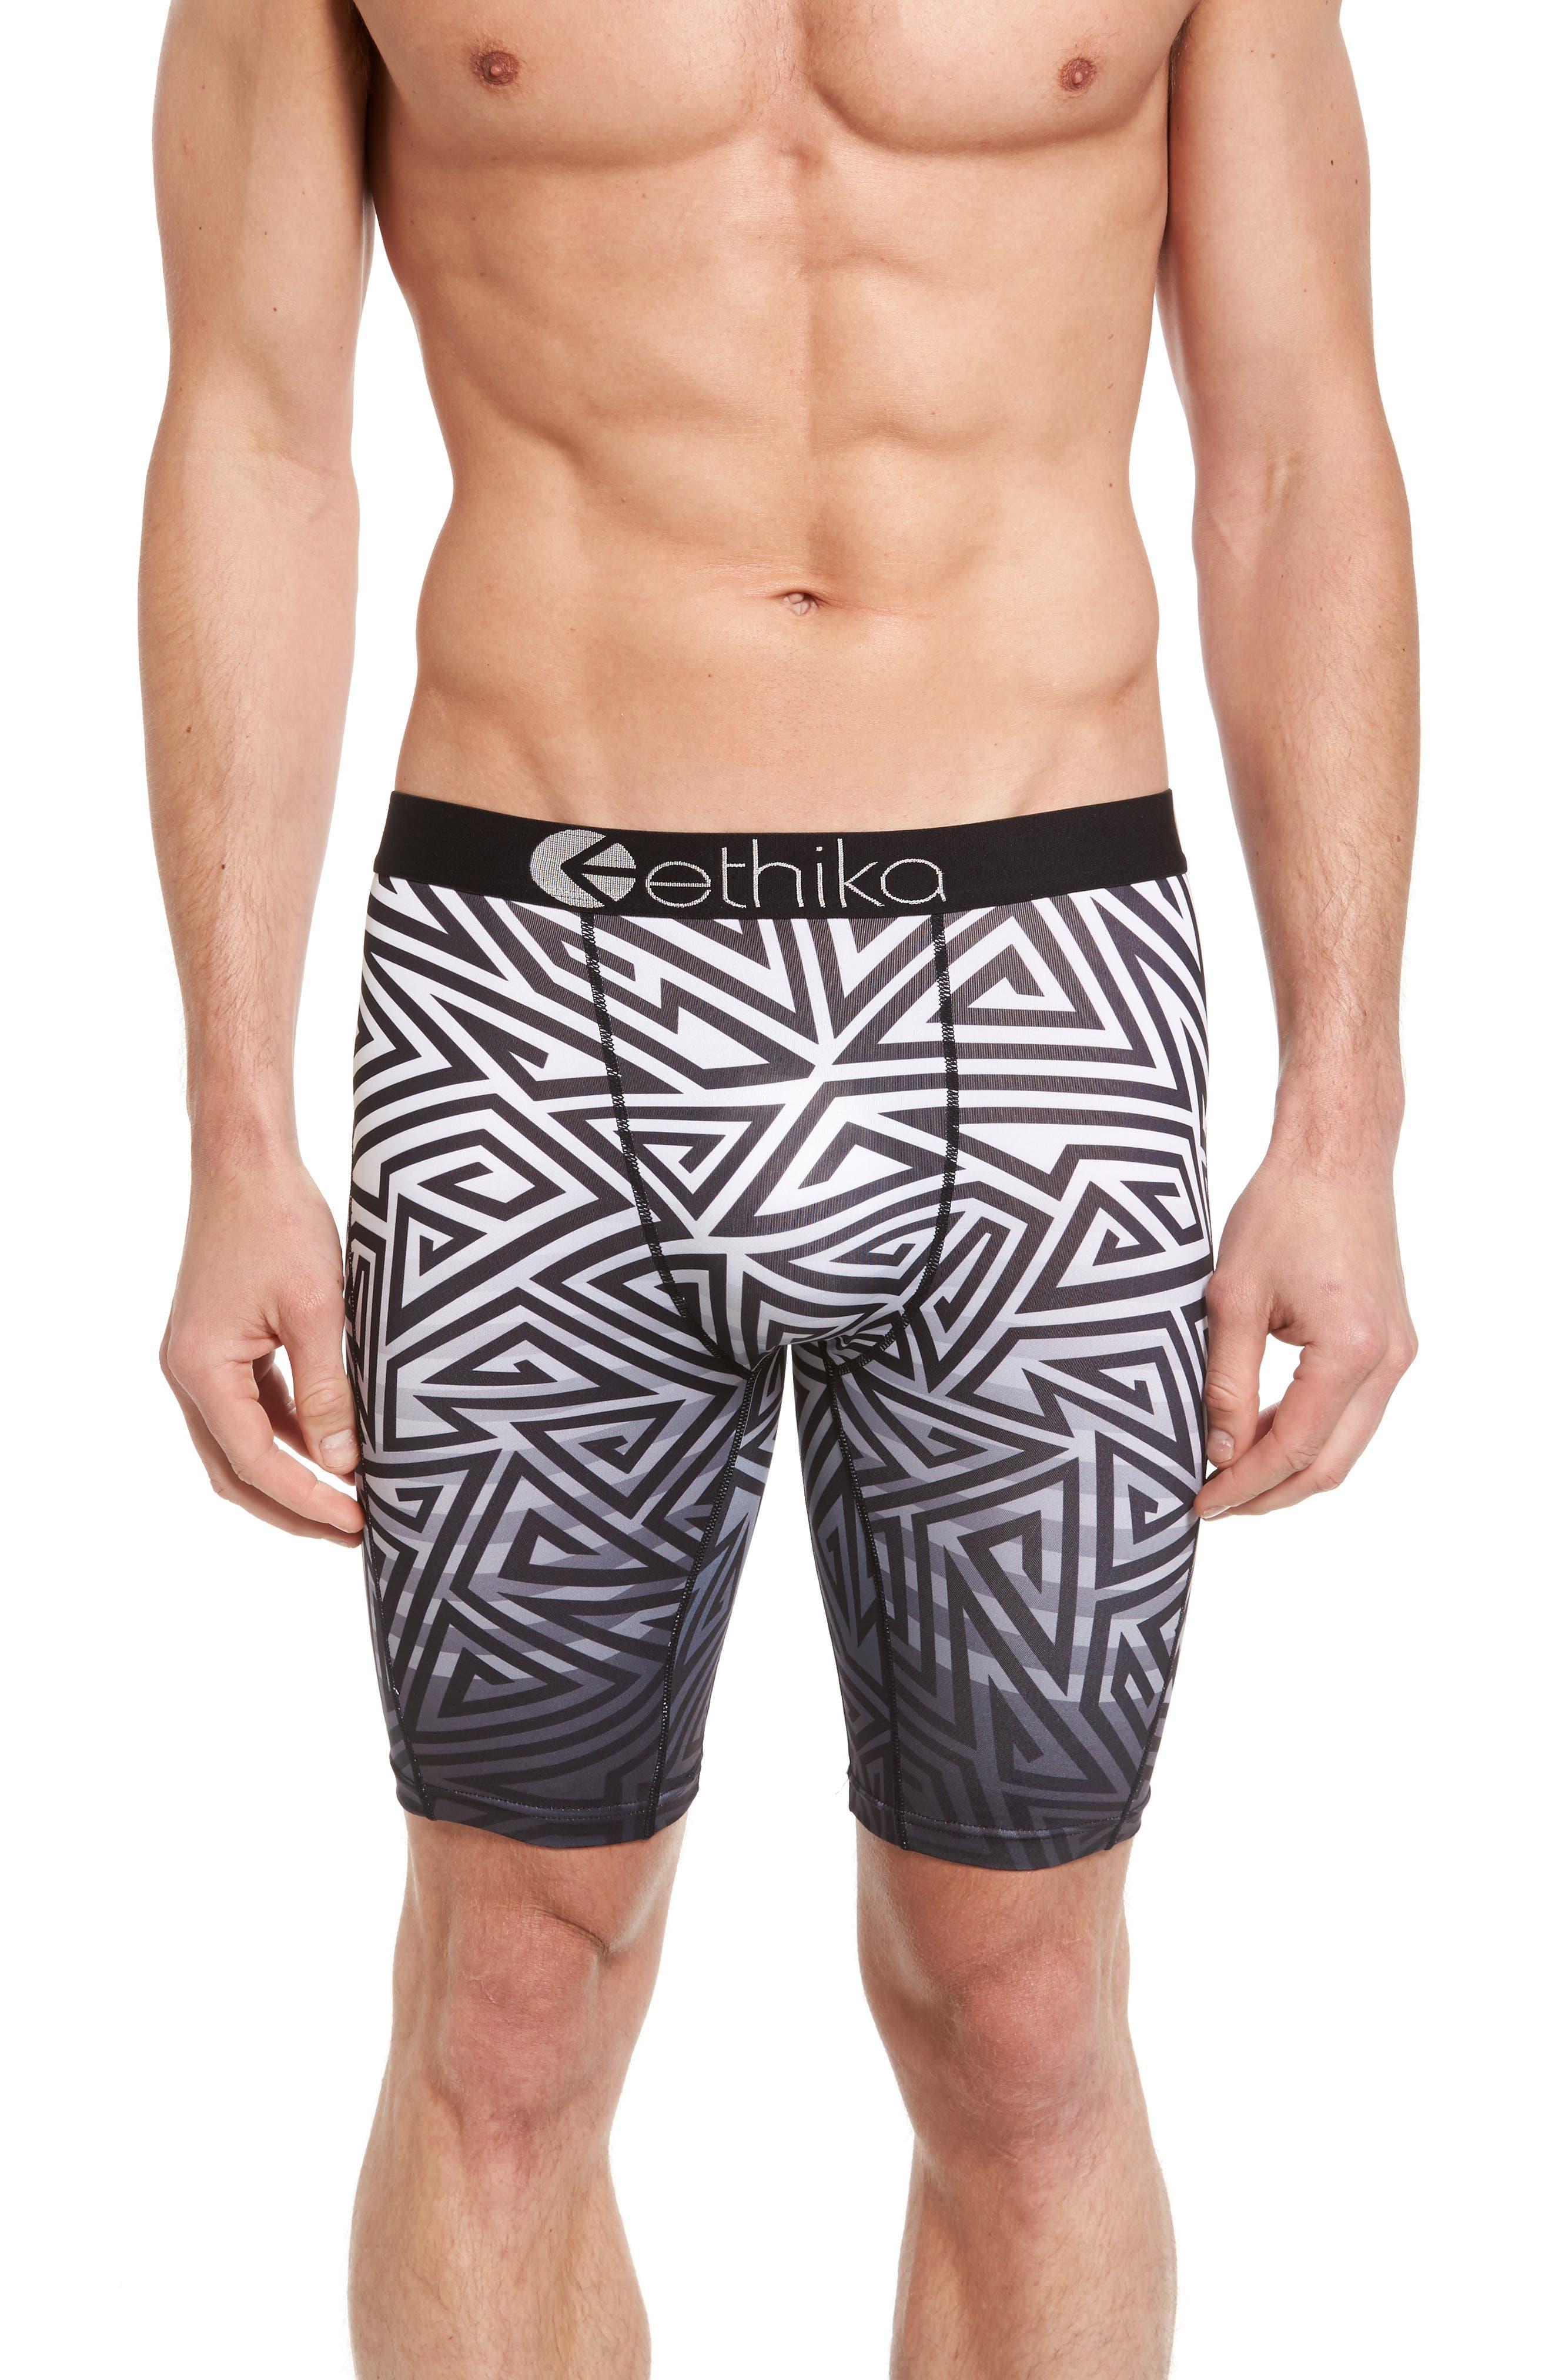 Focus Stretch Boxer Briefs,                         Main,                         color, Black/ White